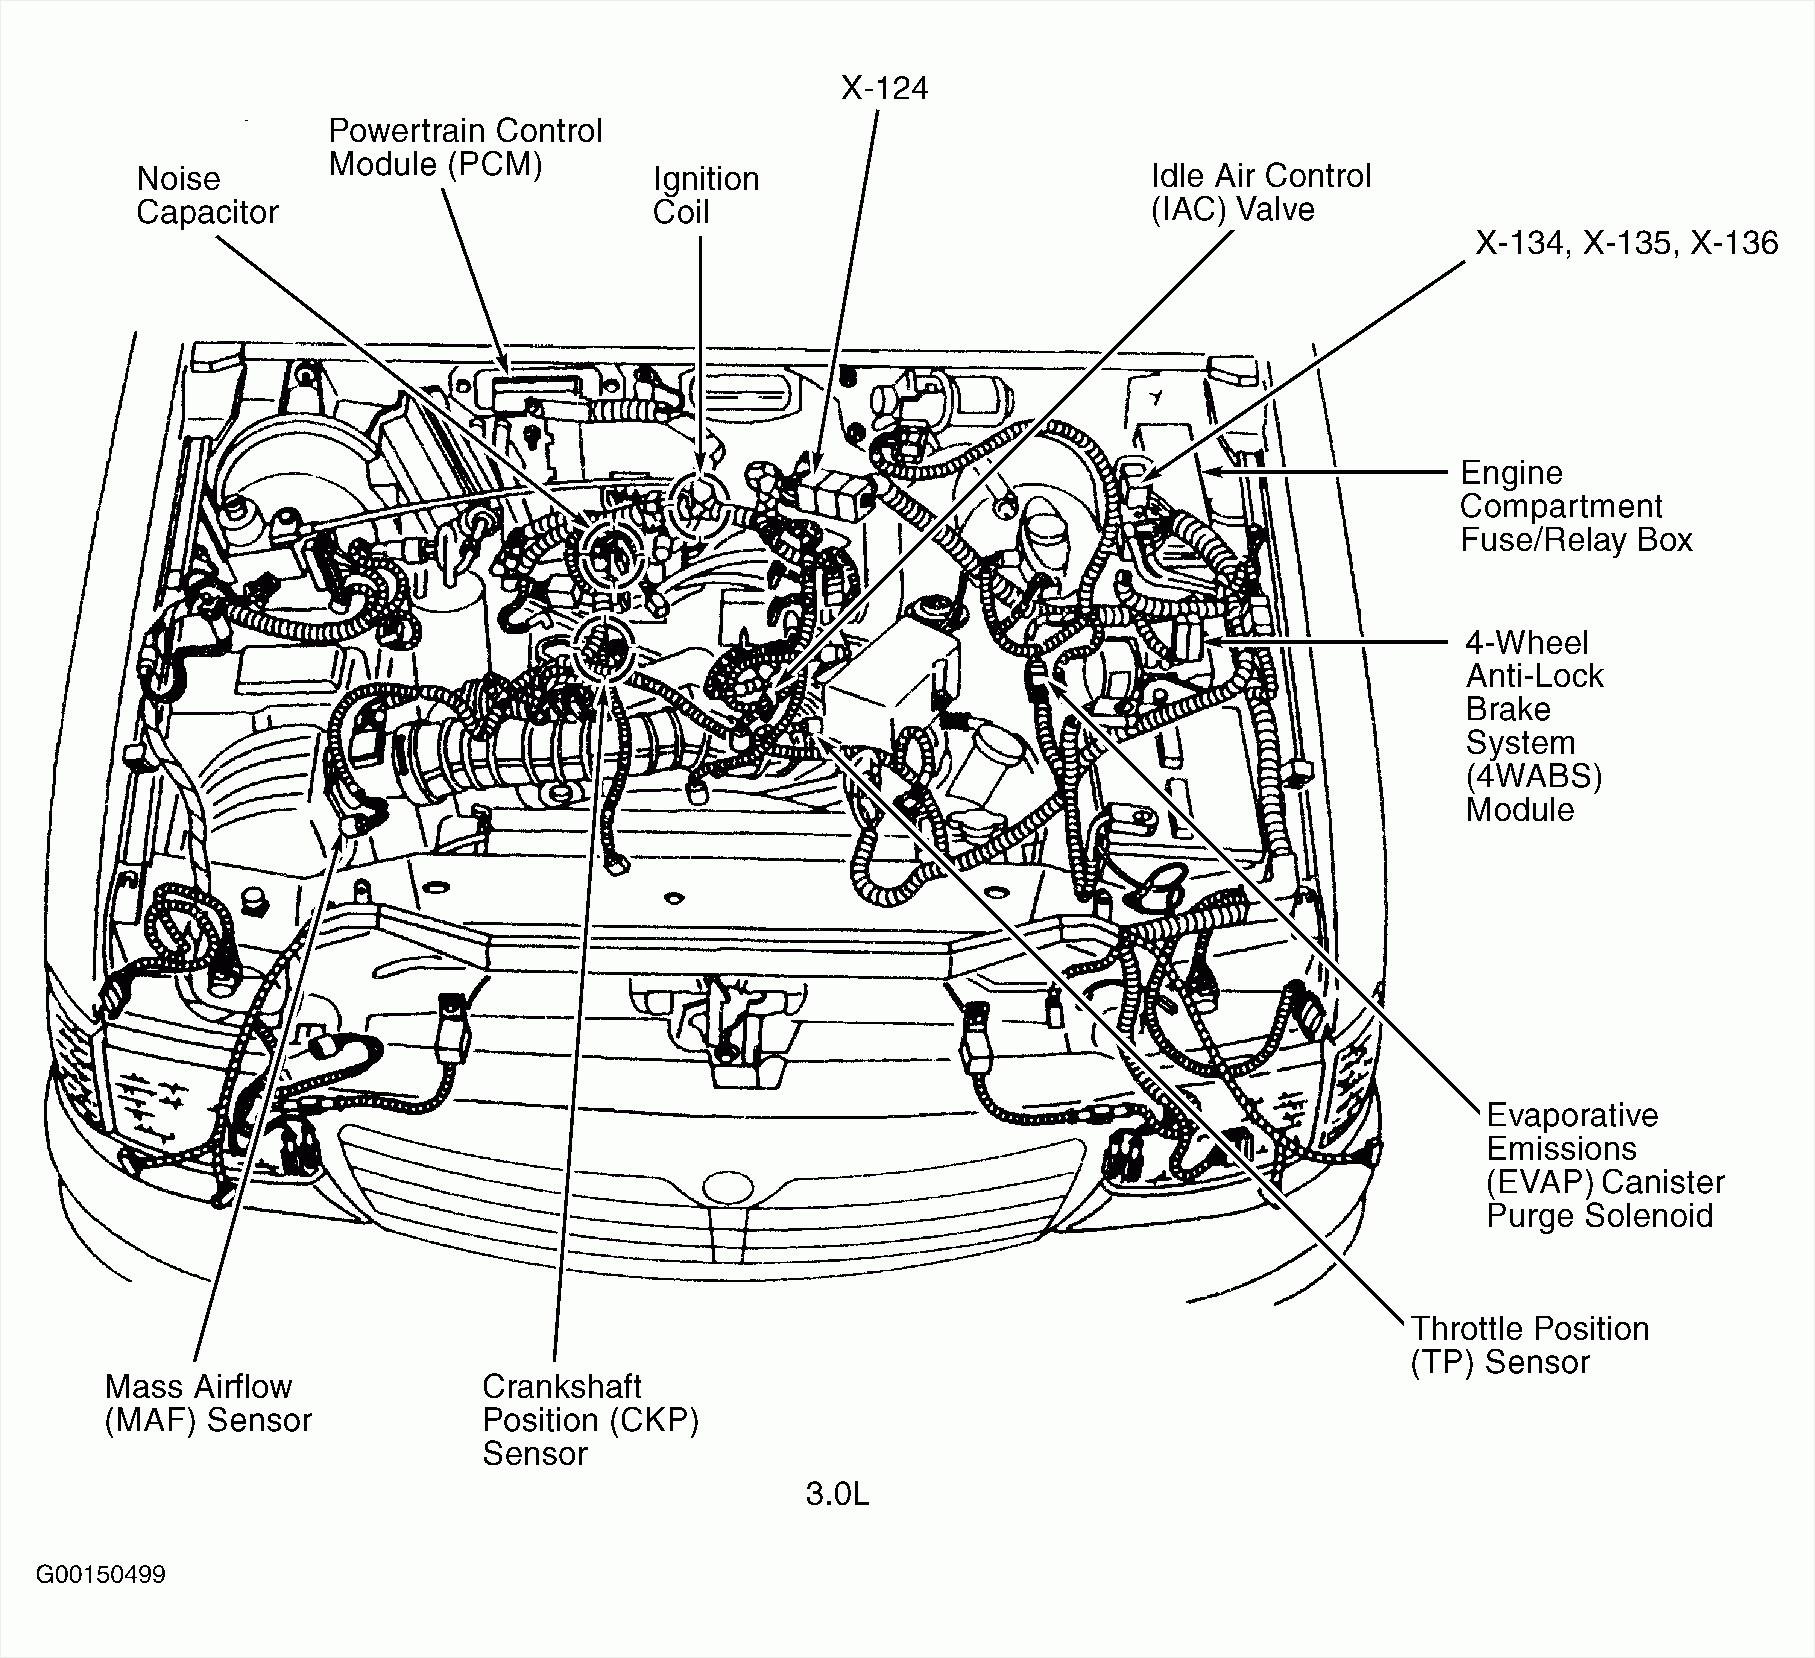 WS_8518] 2002 Mazda 626 Engine Diagram Car Tuning Wiring DiagramGarna Tixat Mohammedshrine Librar Wiring 101